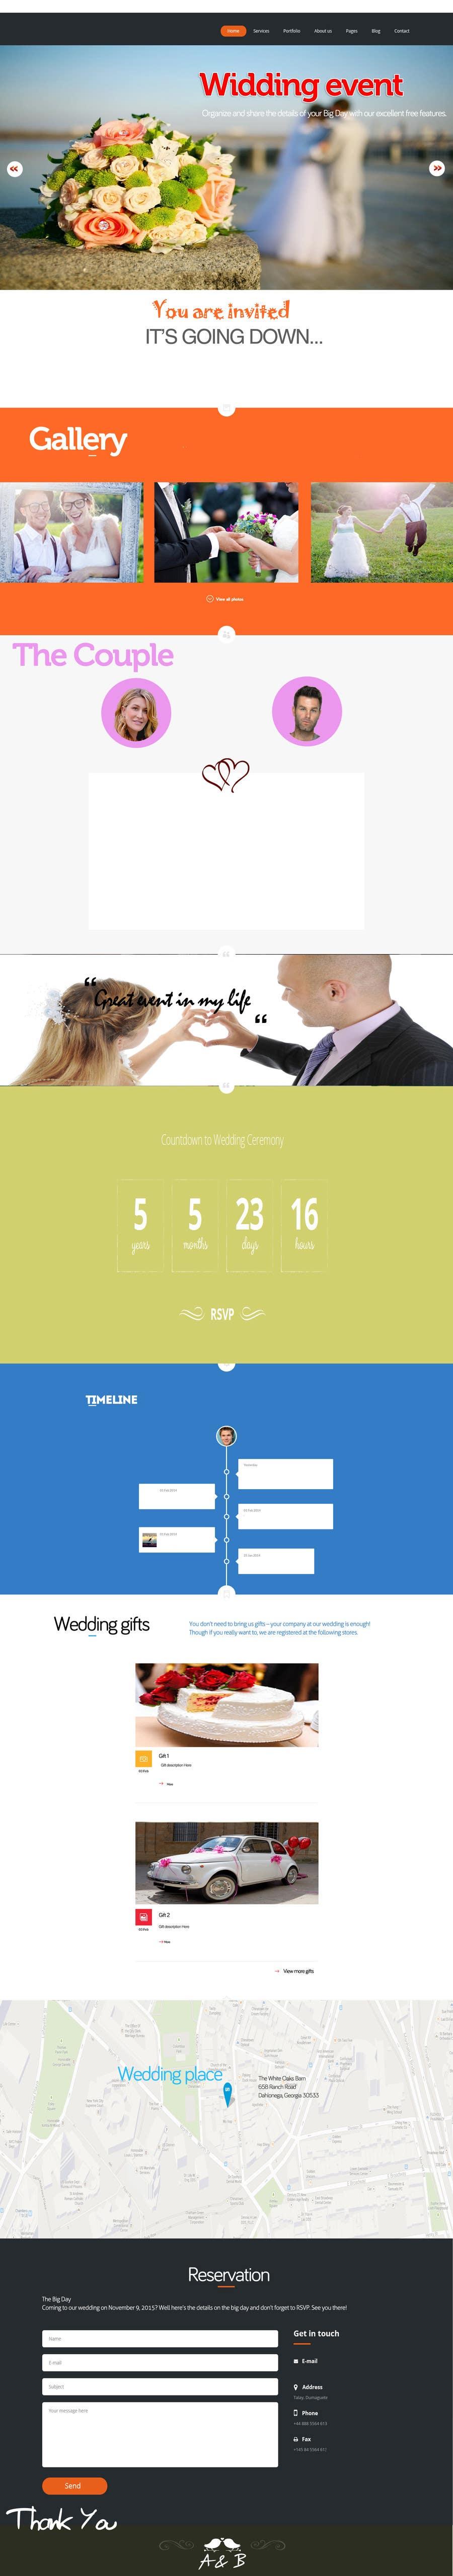 Penyertaan Peraduan #                                        6                                      untuk                                         Wedding design - one page template